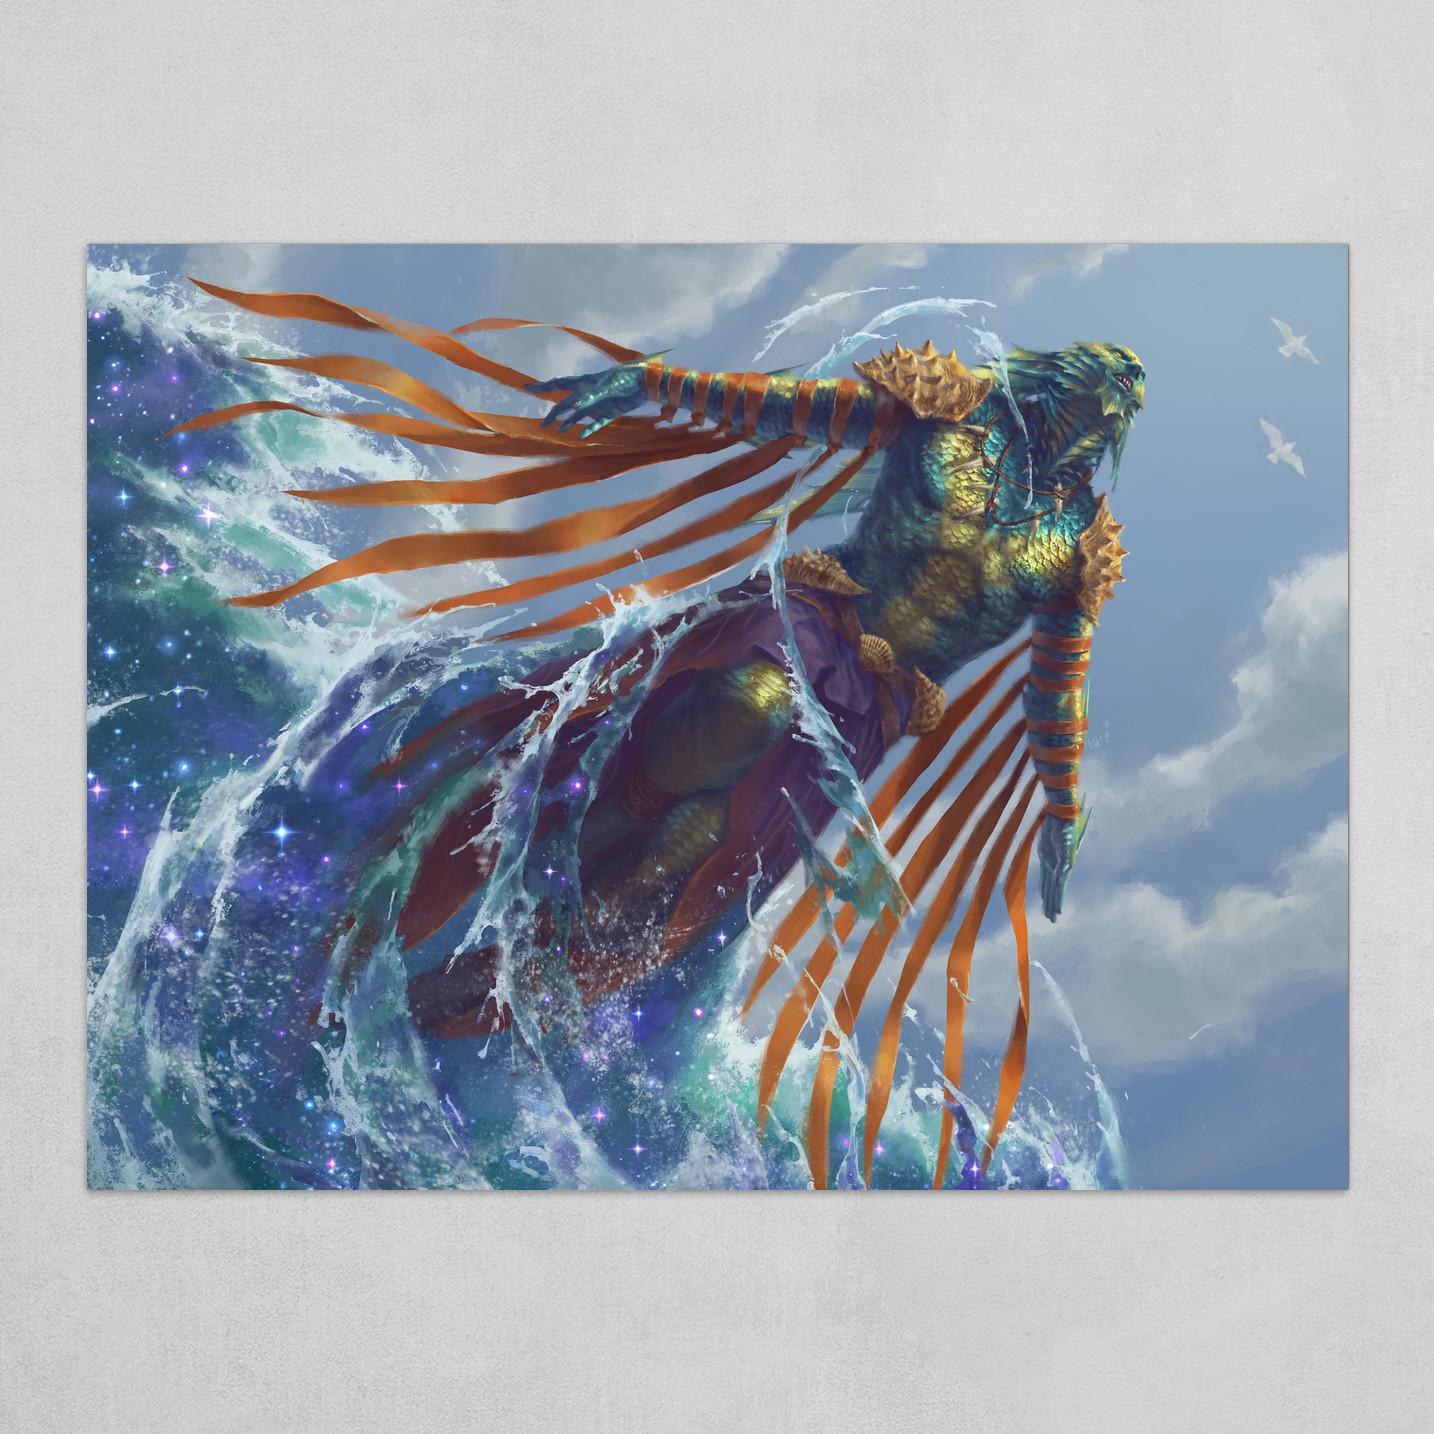 Triton Waverider